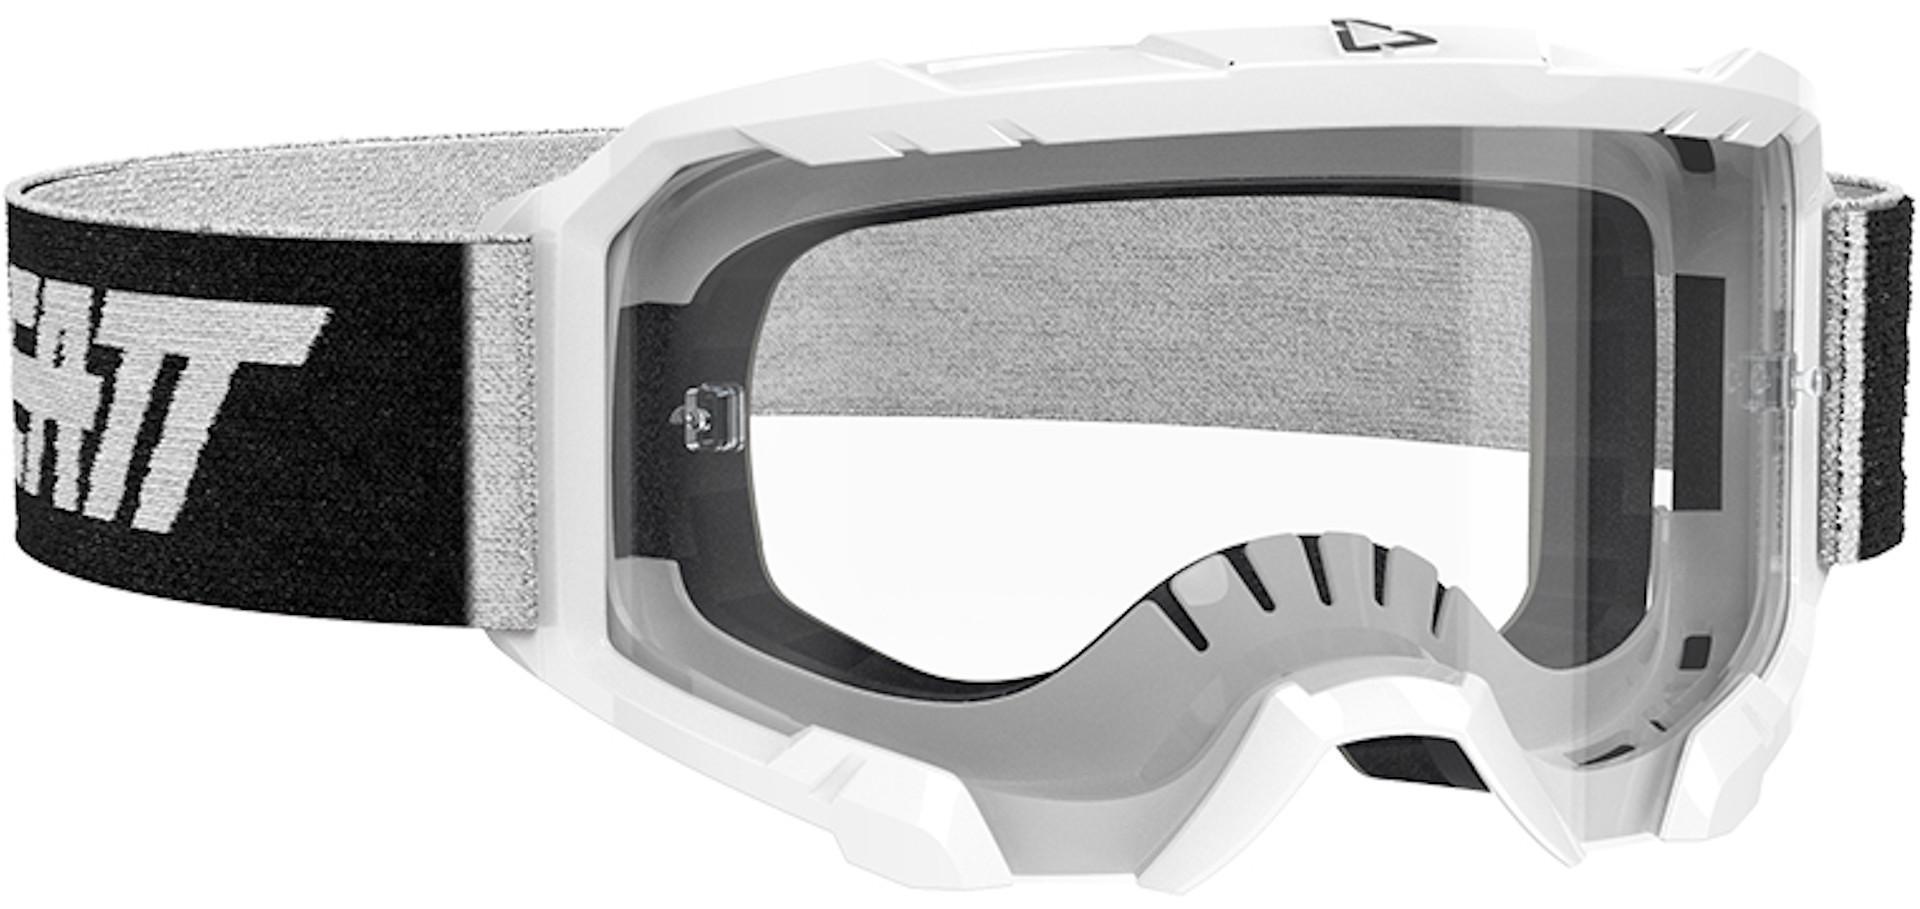 Leatt Velosity 4.5 Goggle White Clear 83% Image